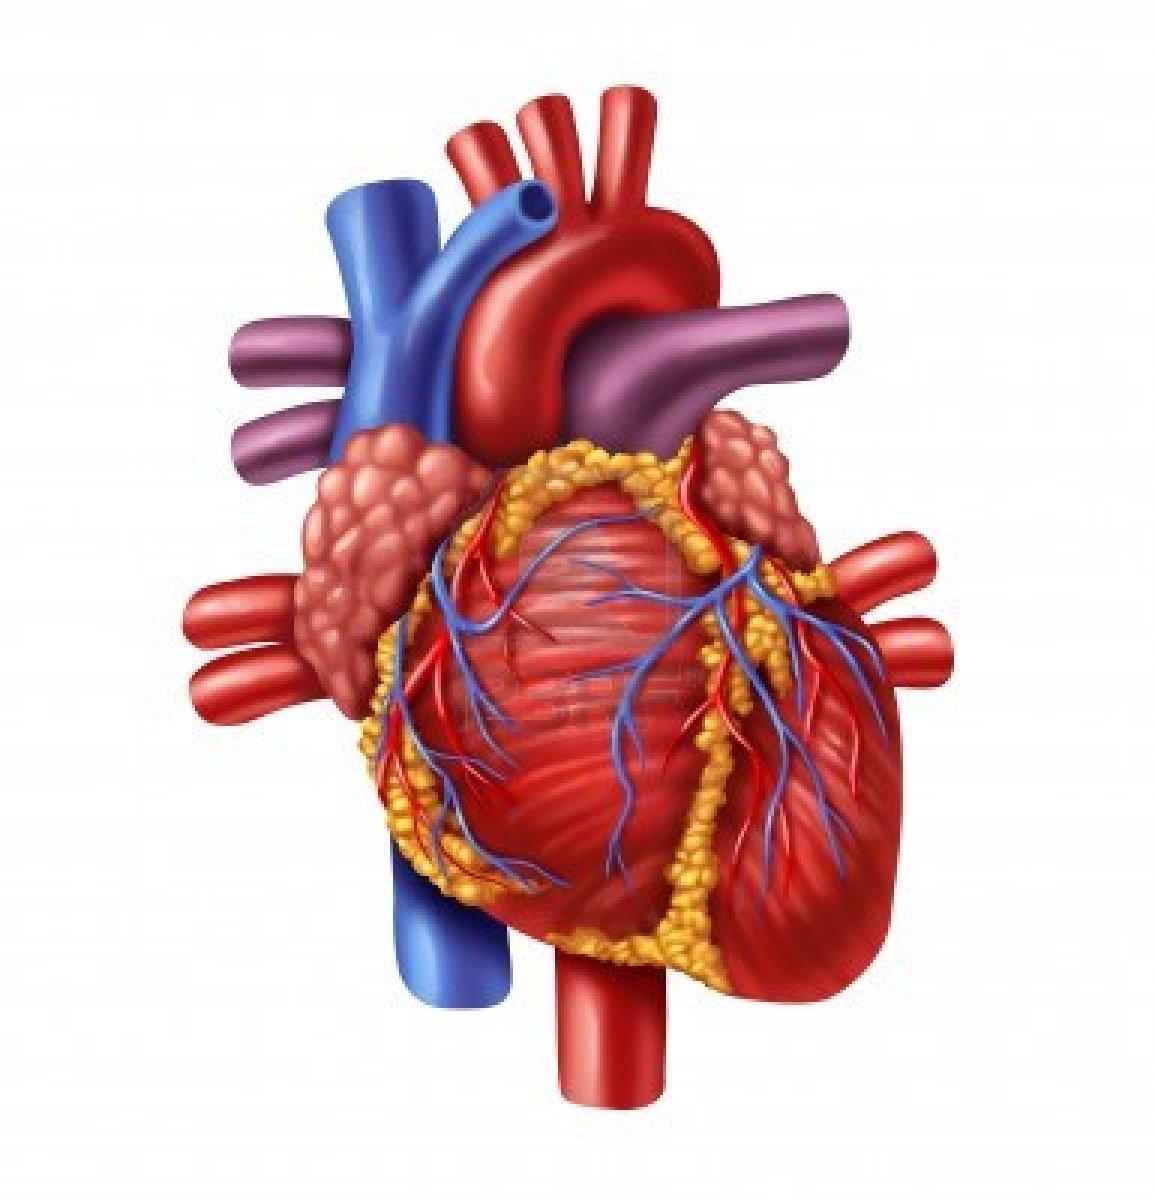 Heart Diagram Unlabeled - ClipArt Best